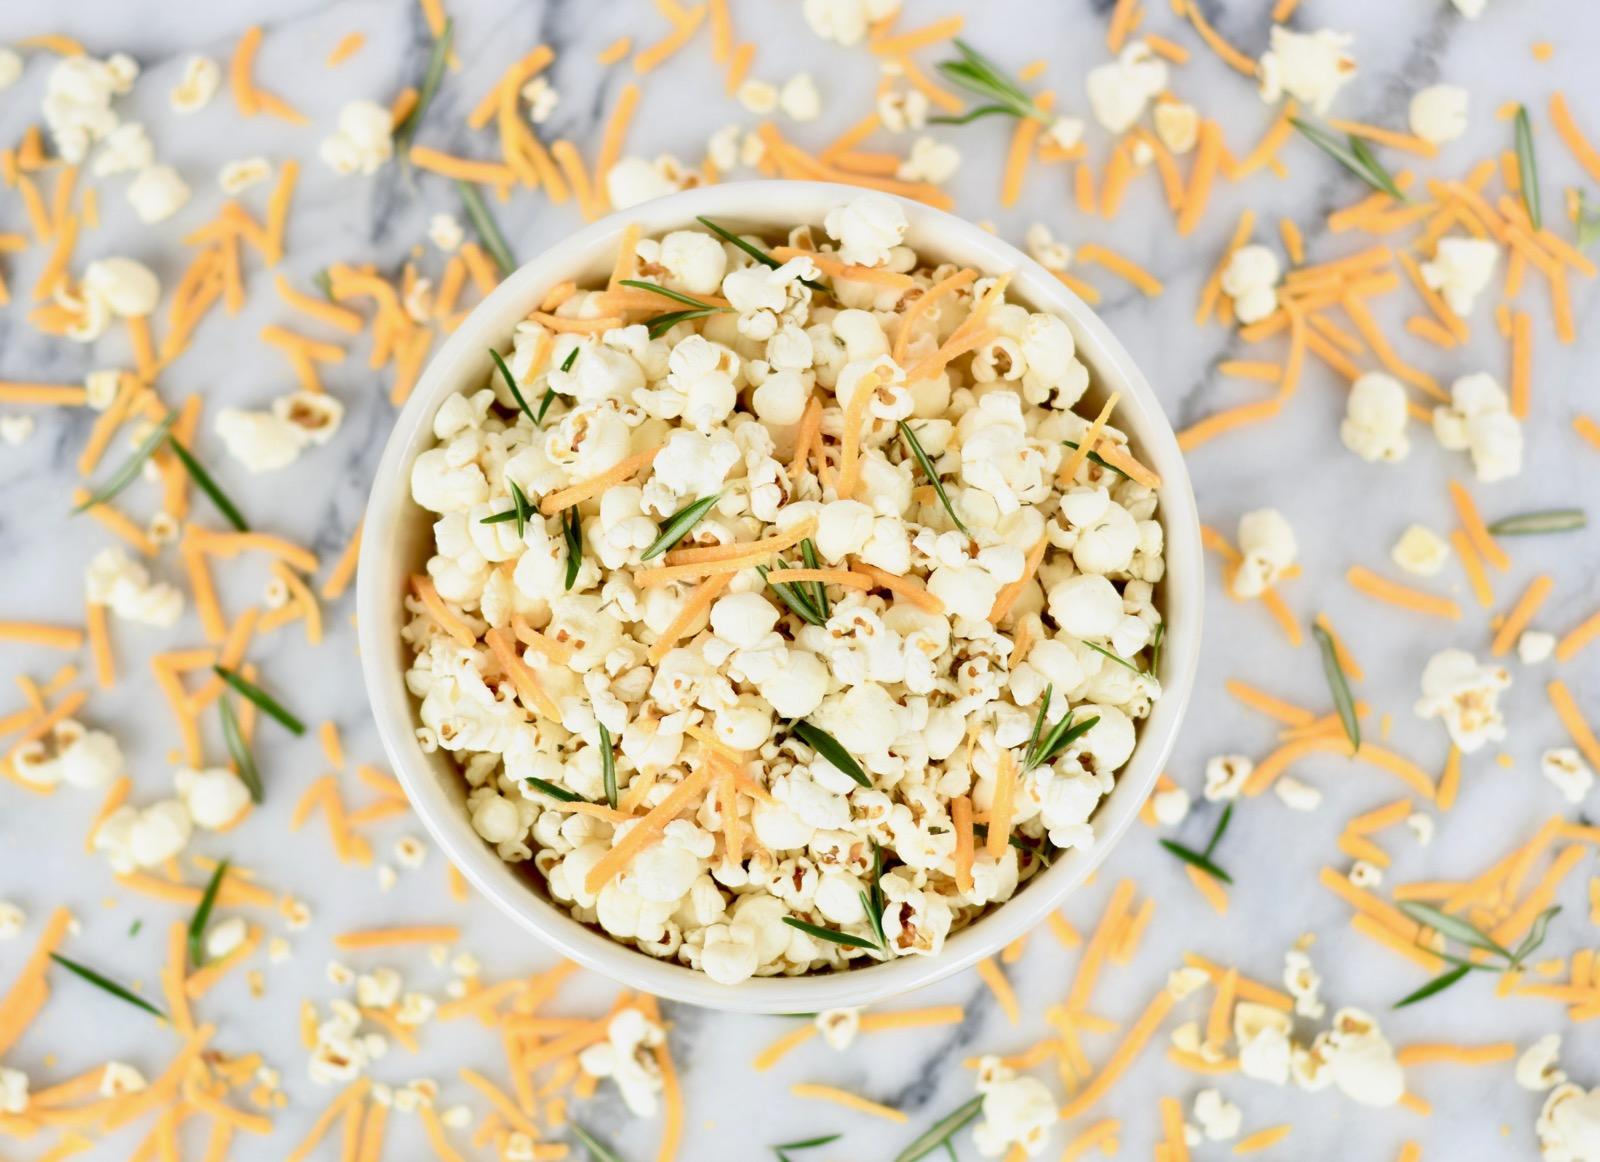 Rosemary Thyme Cheddar Popcorn Recipe